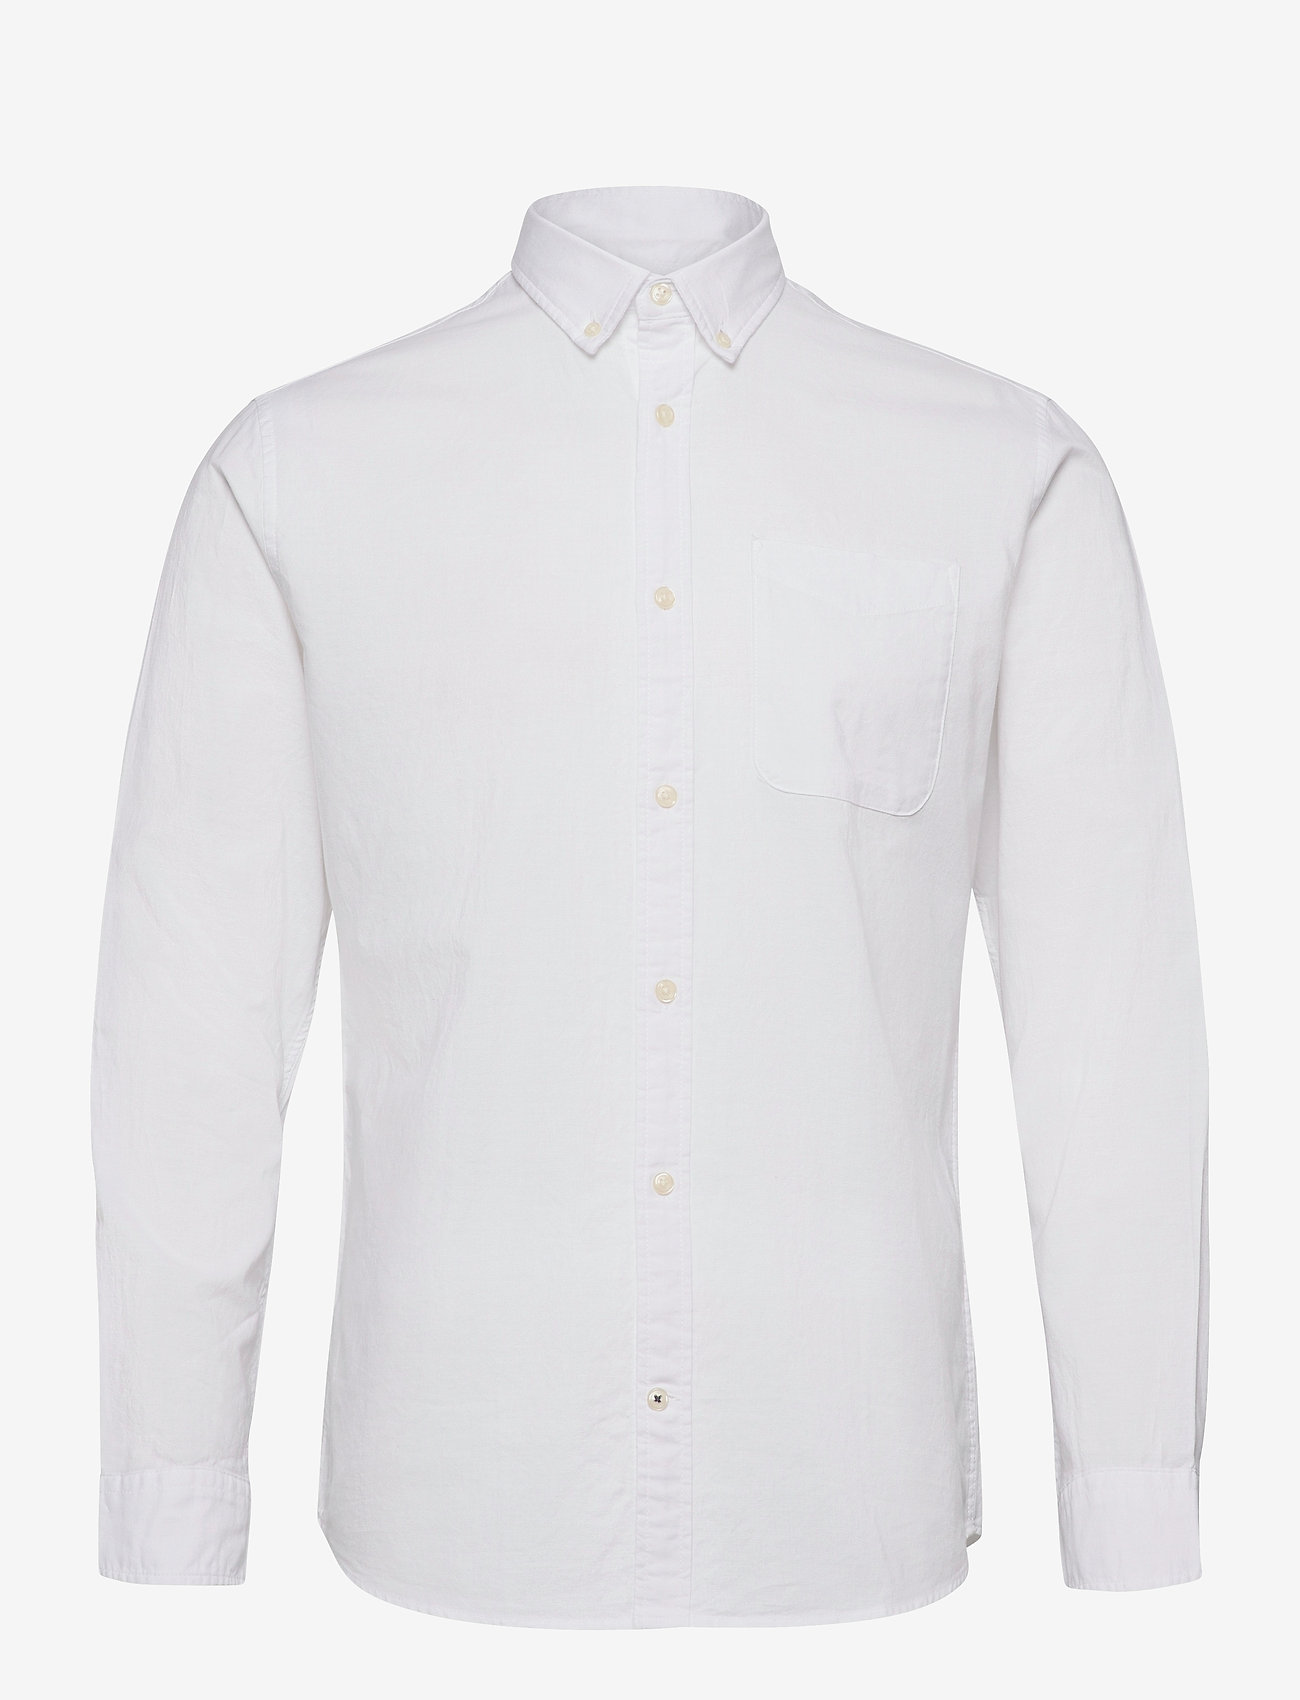 Jack & Jones - JJEOXFORD SHIRT L/S S21 - casual skjortor - white - 0